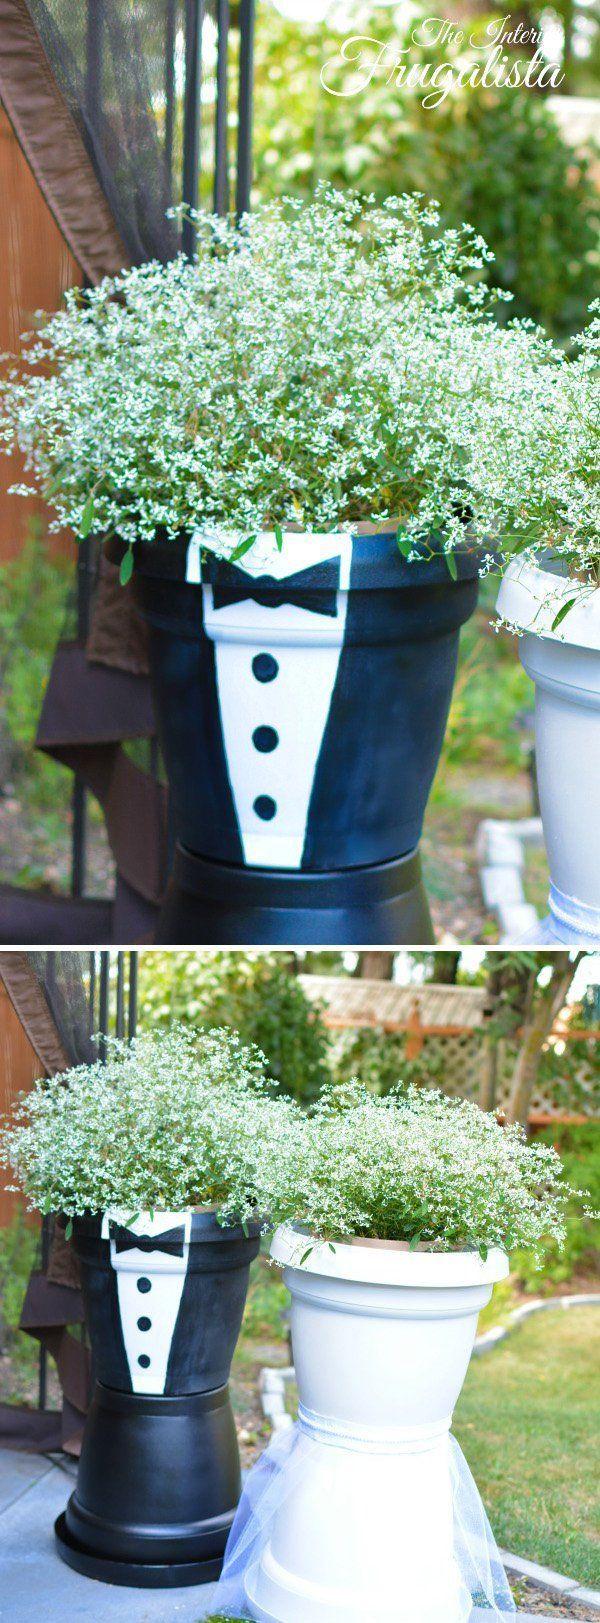 Idee Per Vasi Da Fiori oltre 40 idee per vasi da fiori fai-da-te | versierde